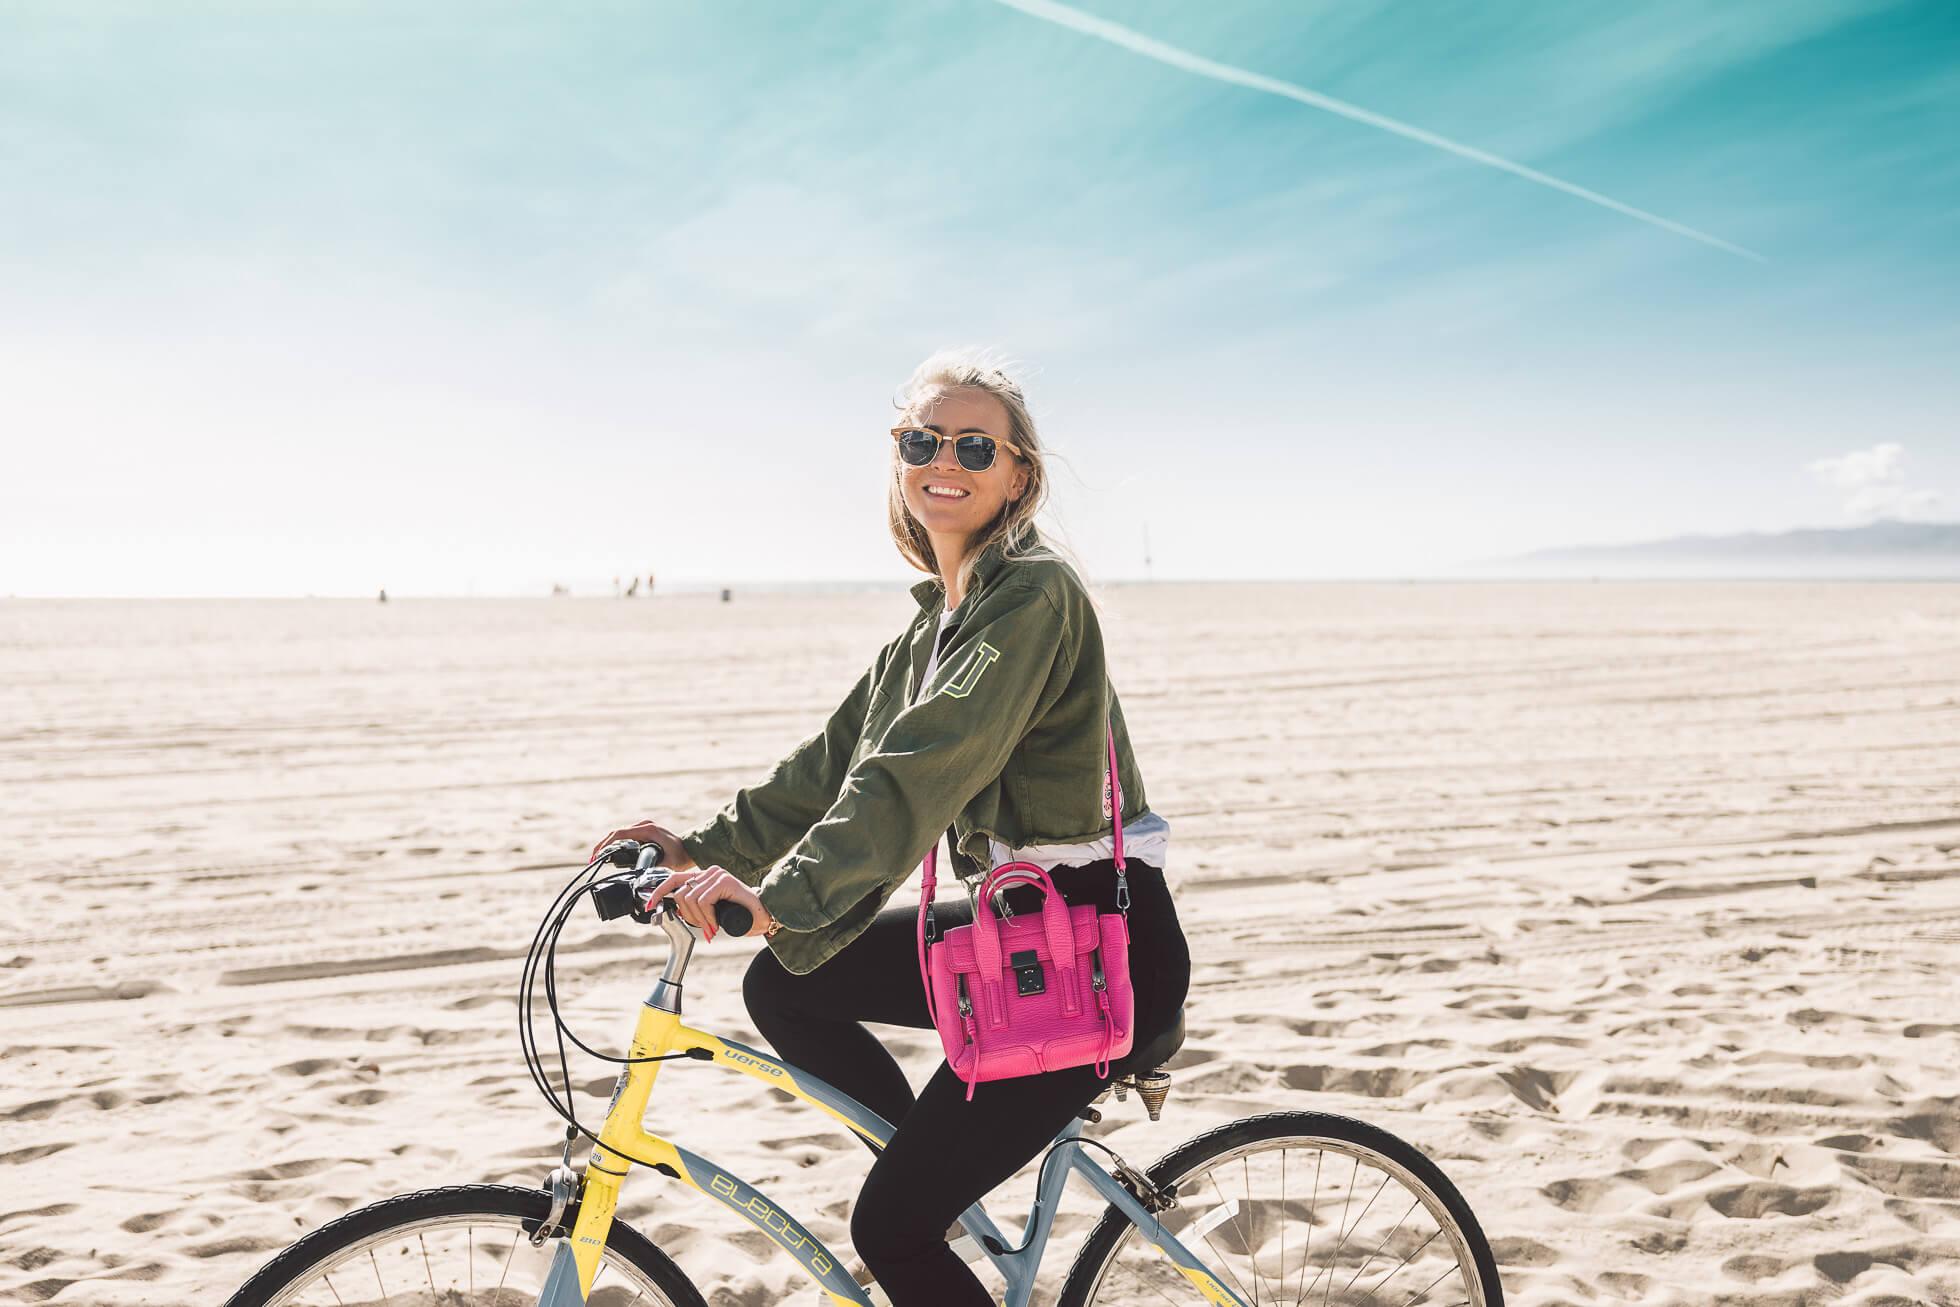 janni-deler-bike-ride-veniceL1010478